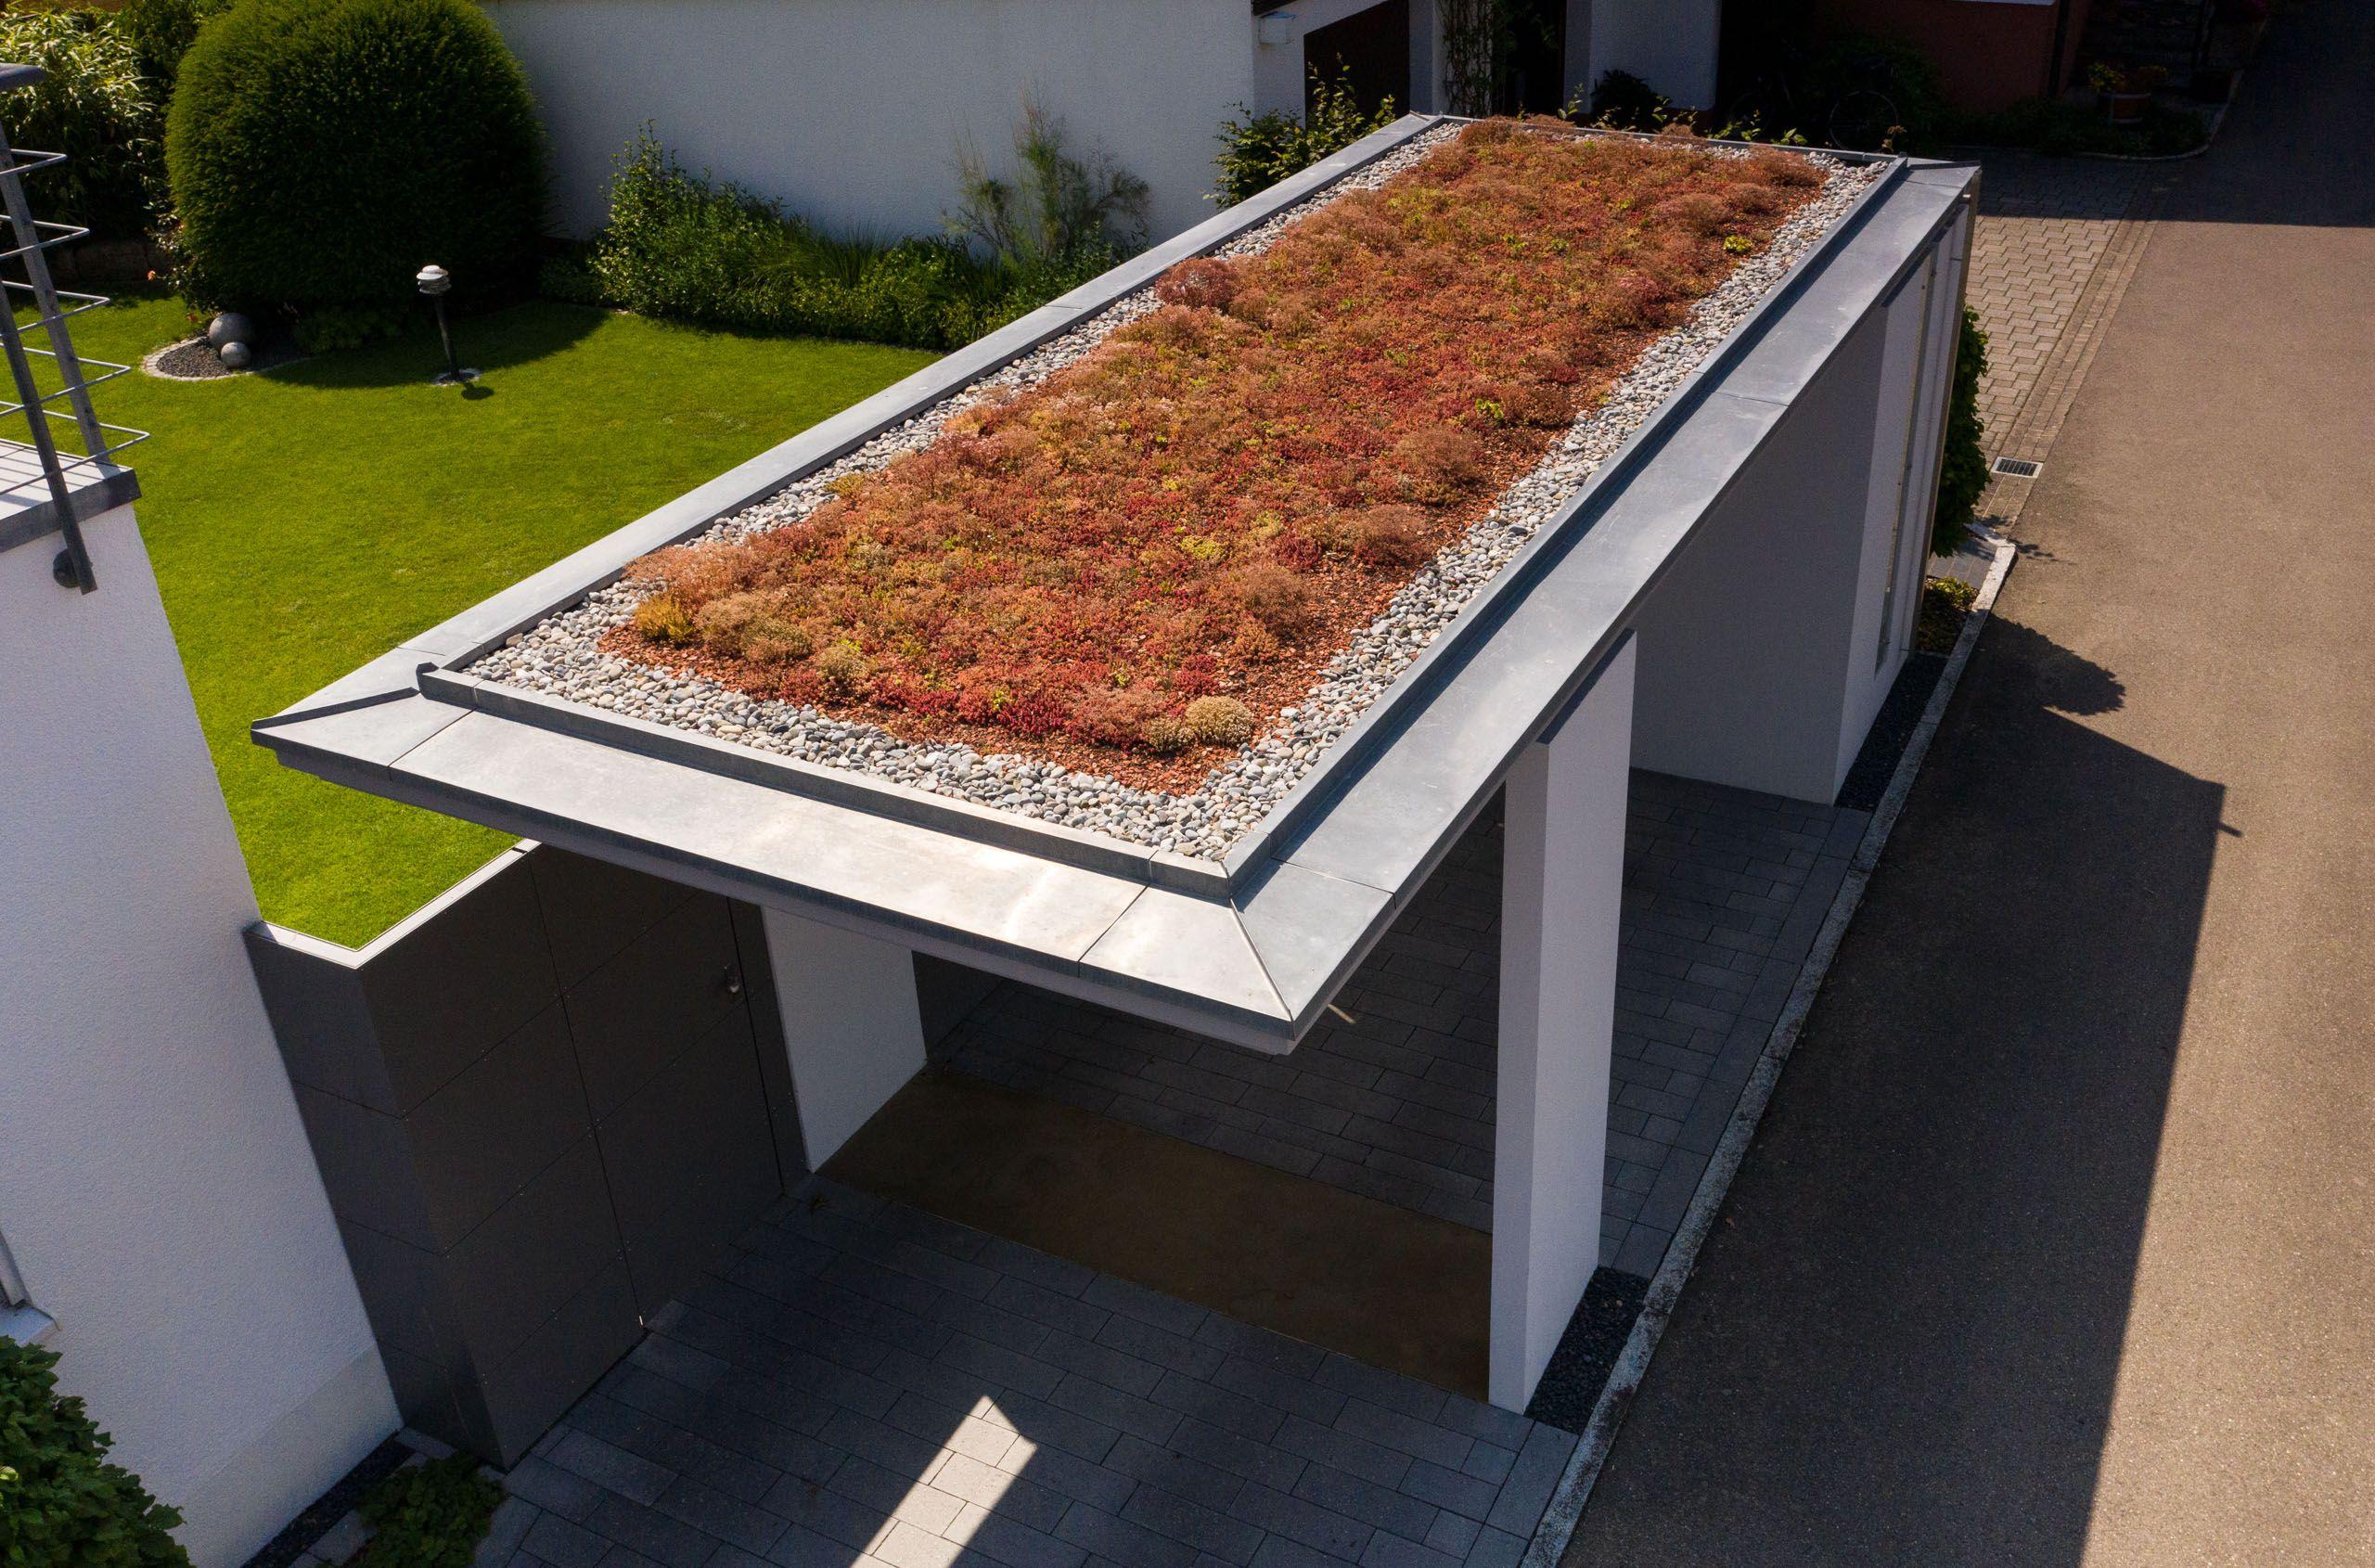 Kport Mit Begrunung Dachbegrunung Extensive Dachbegrunung Augenweide